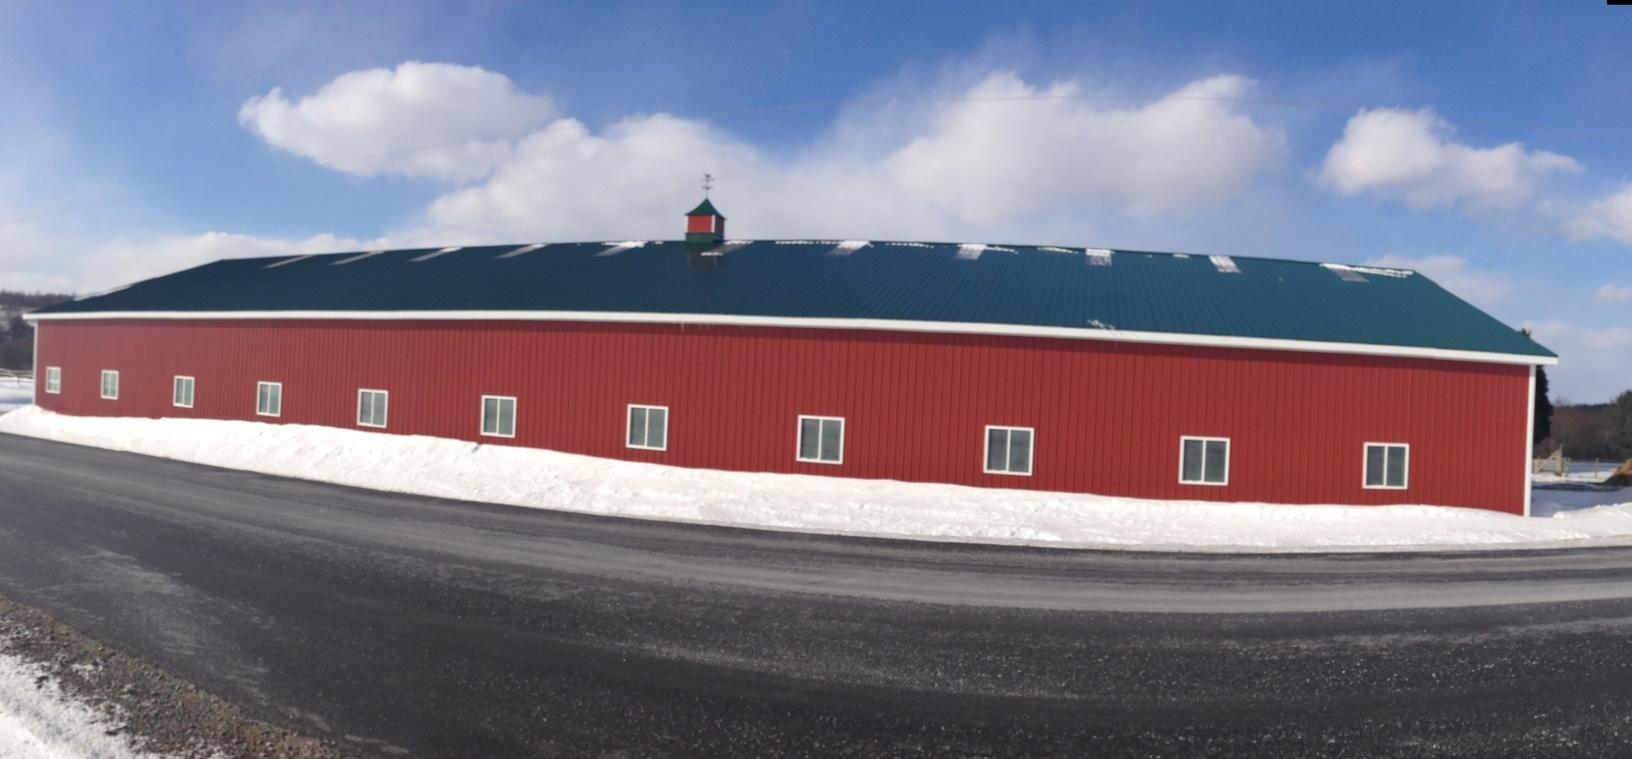 Solar Panel Installation in Cortland, NY - Before Photo